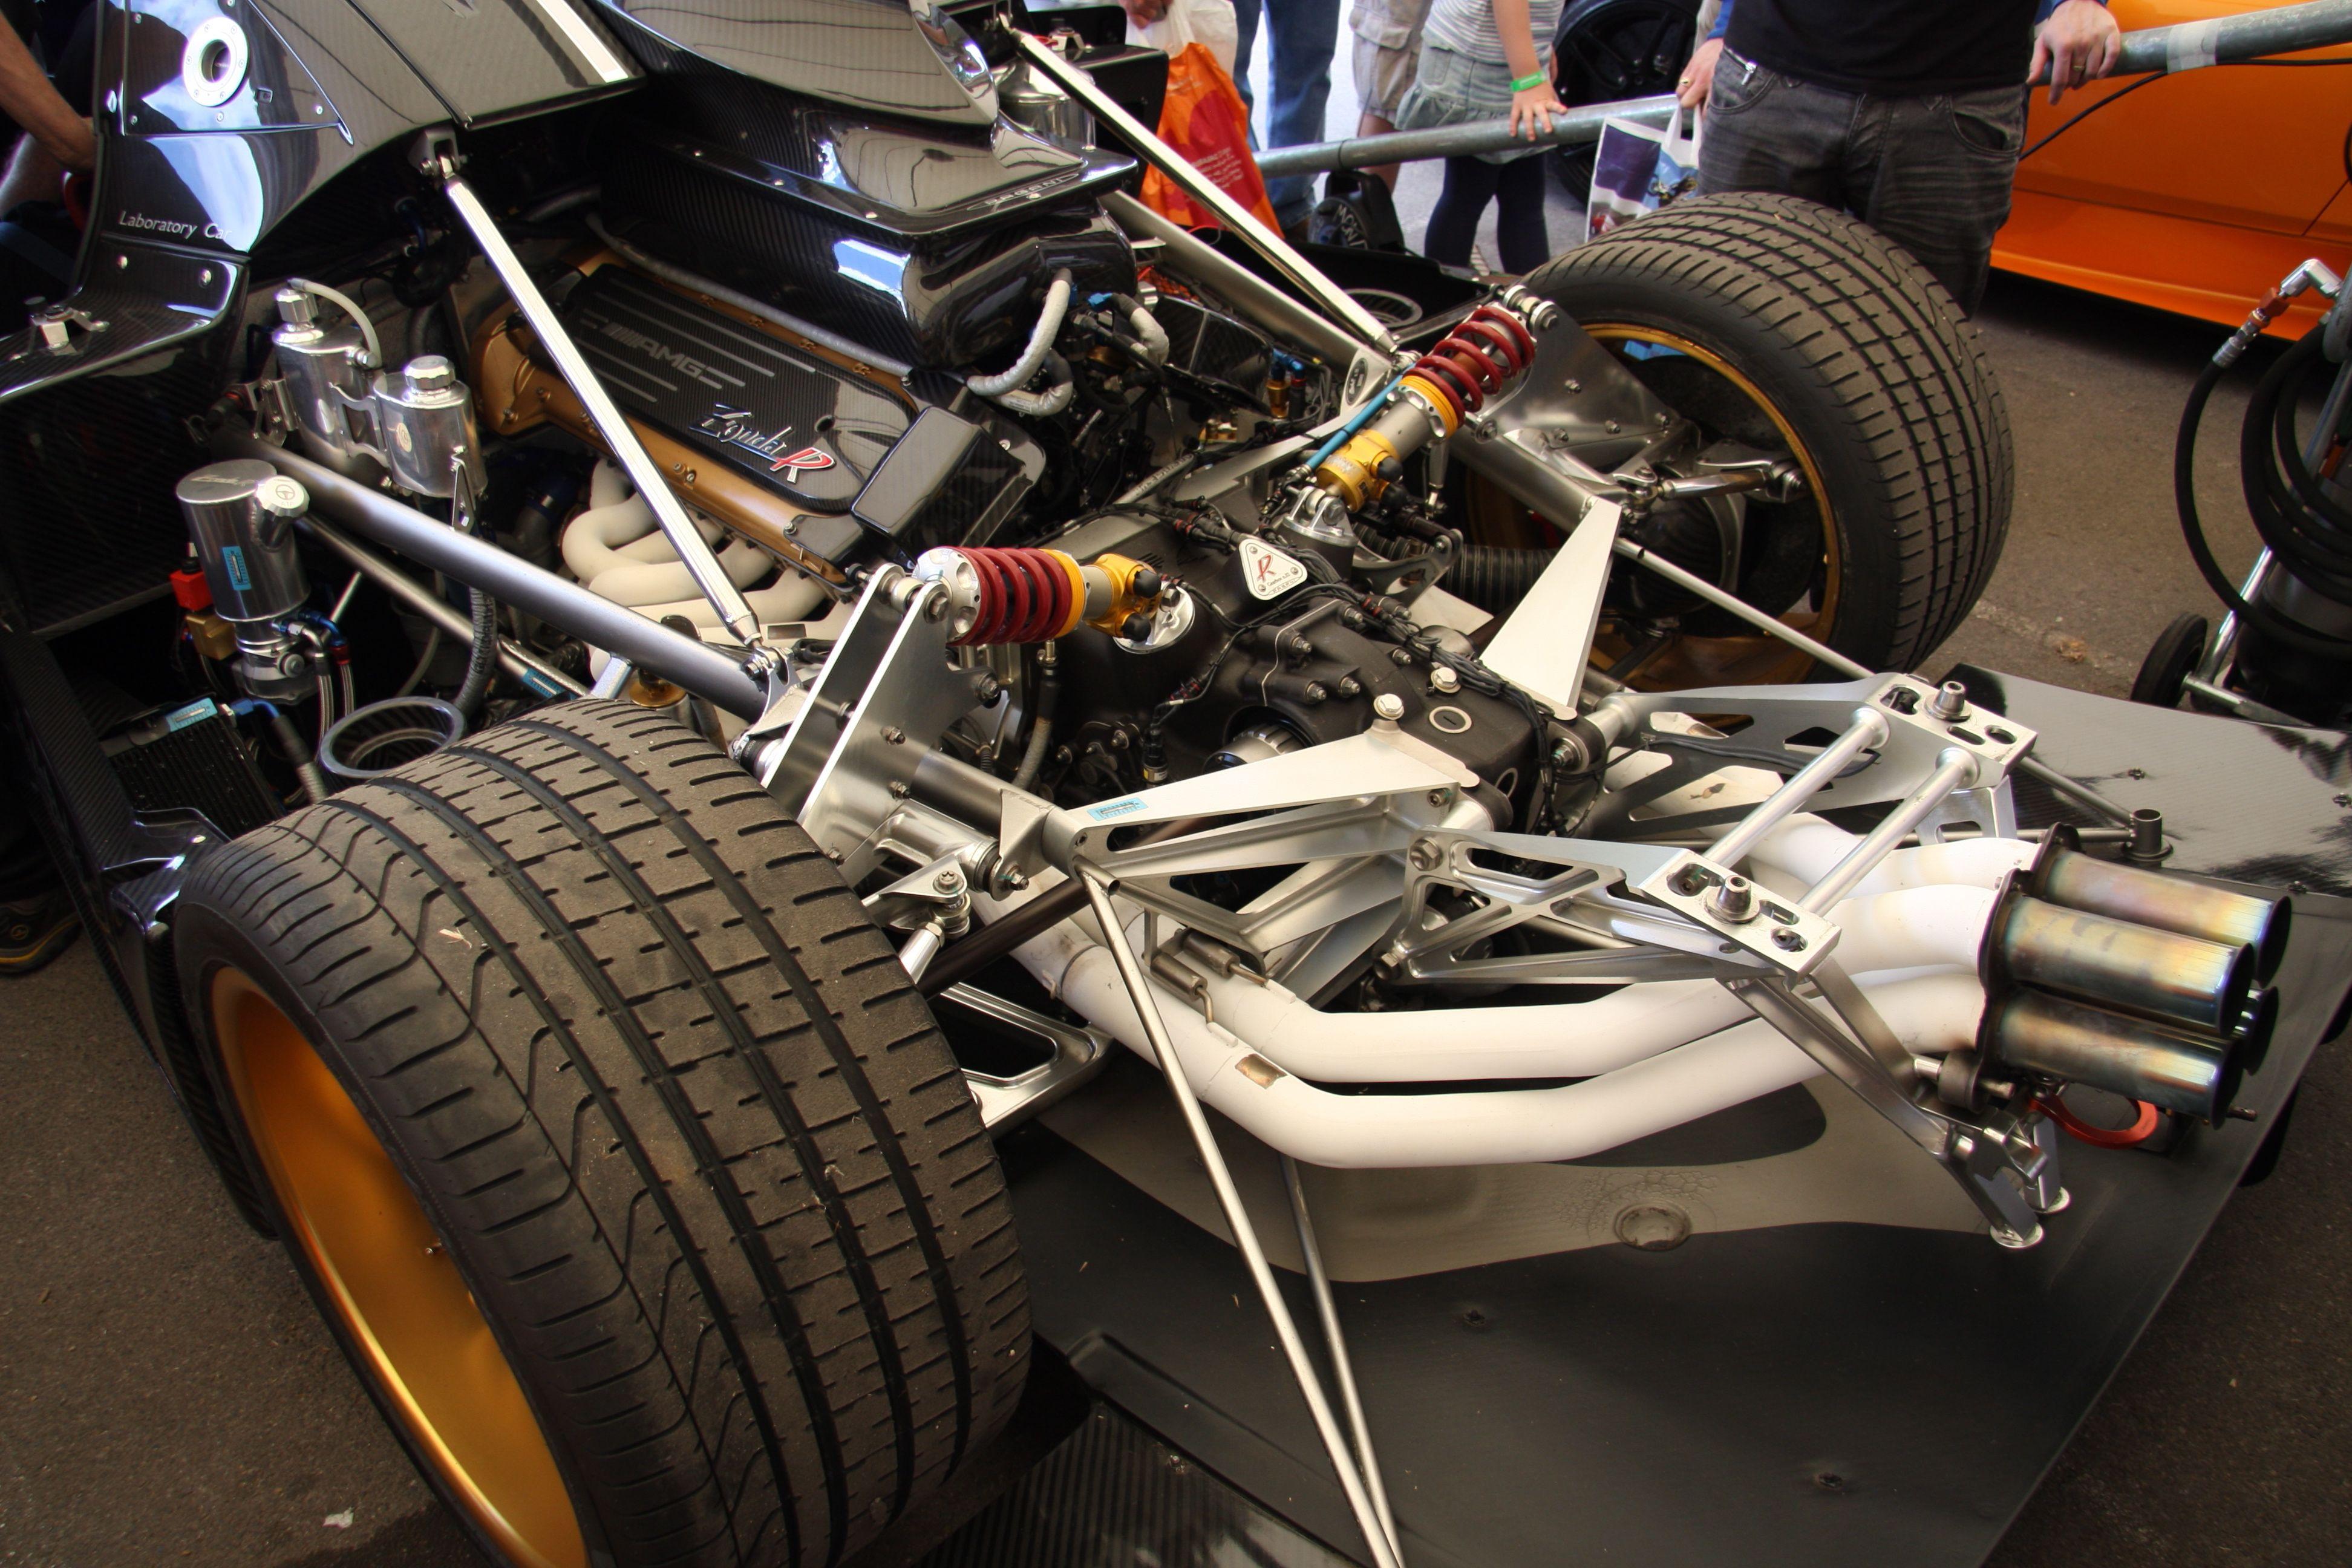 The pagani zonda engine cars and pagani zonda the pagani zonda vanachro Image collections